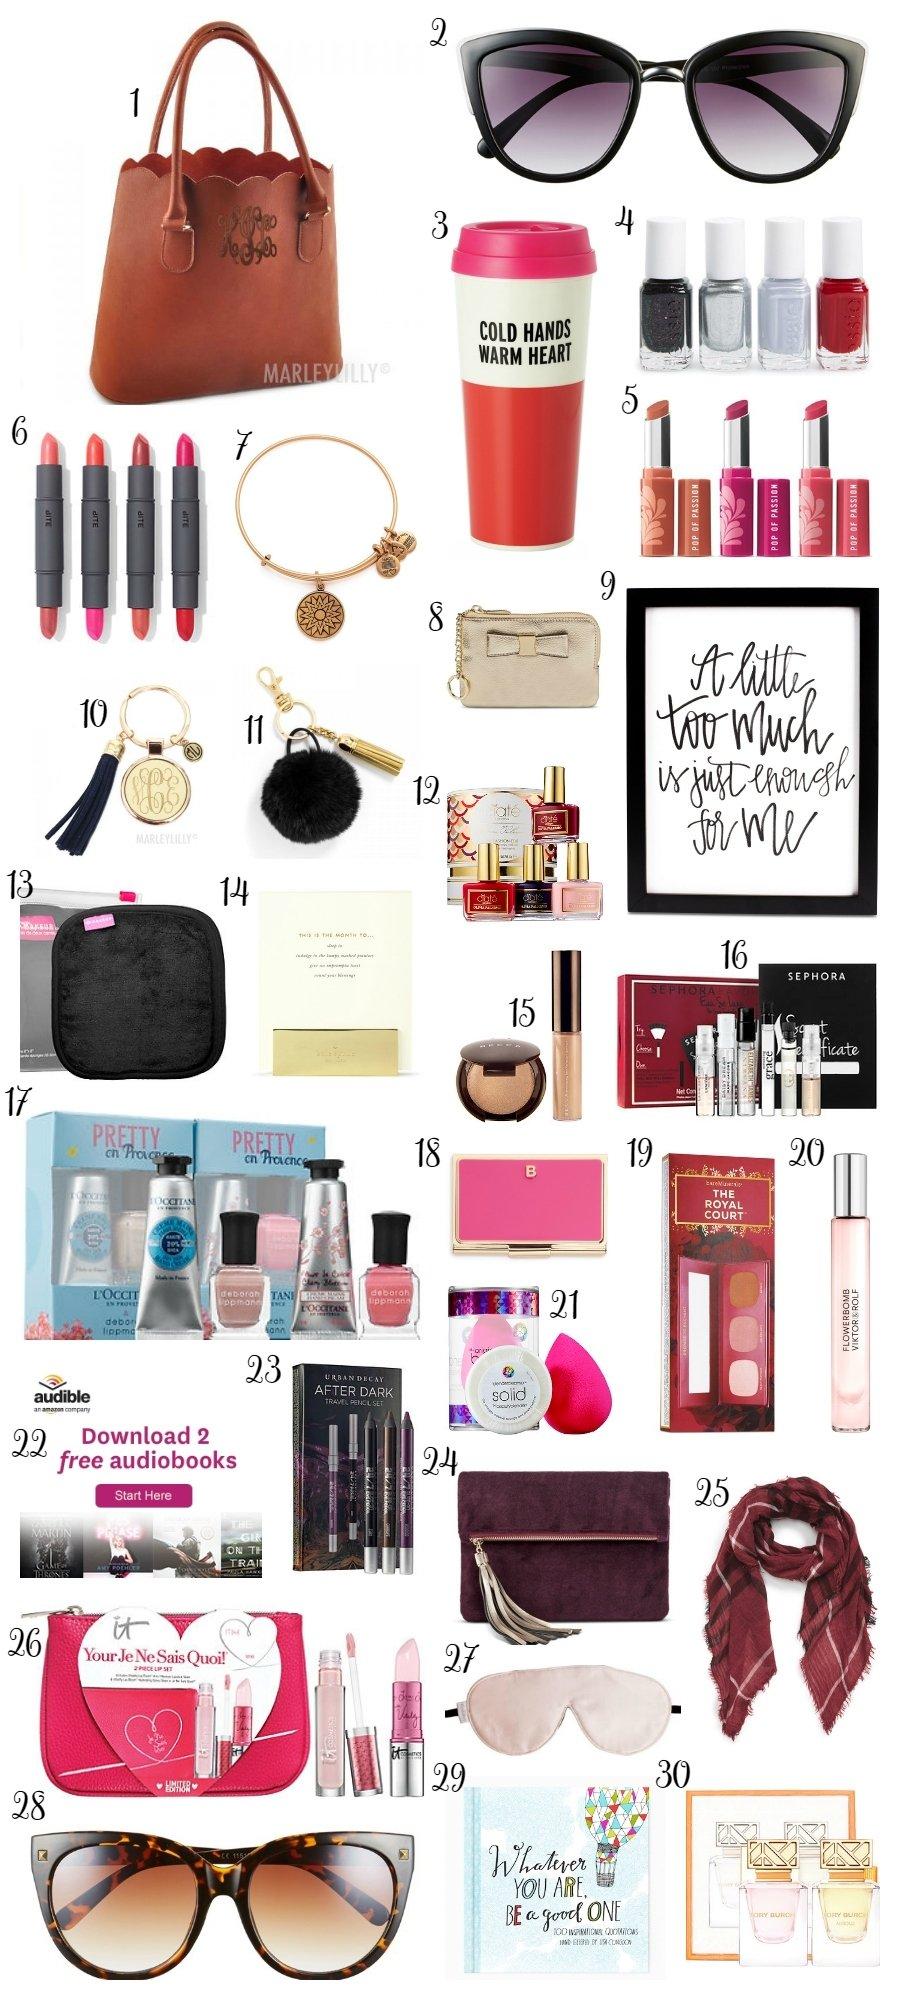 10 Beautiful Gift Ideas For Women 30 christmas gift ideas under 30 ashley brooke nicholas 2